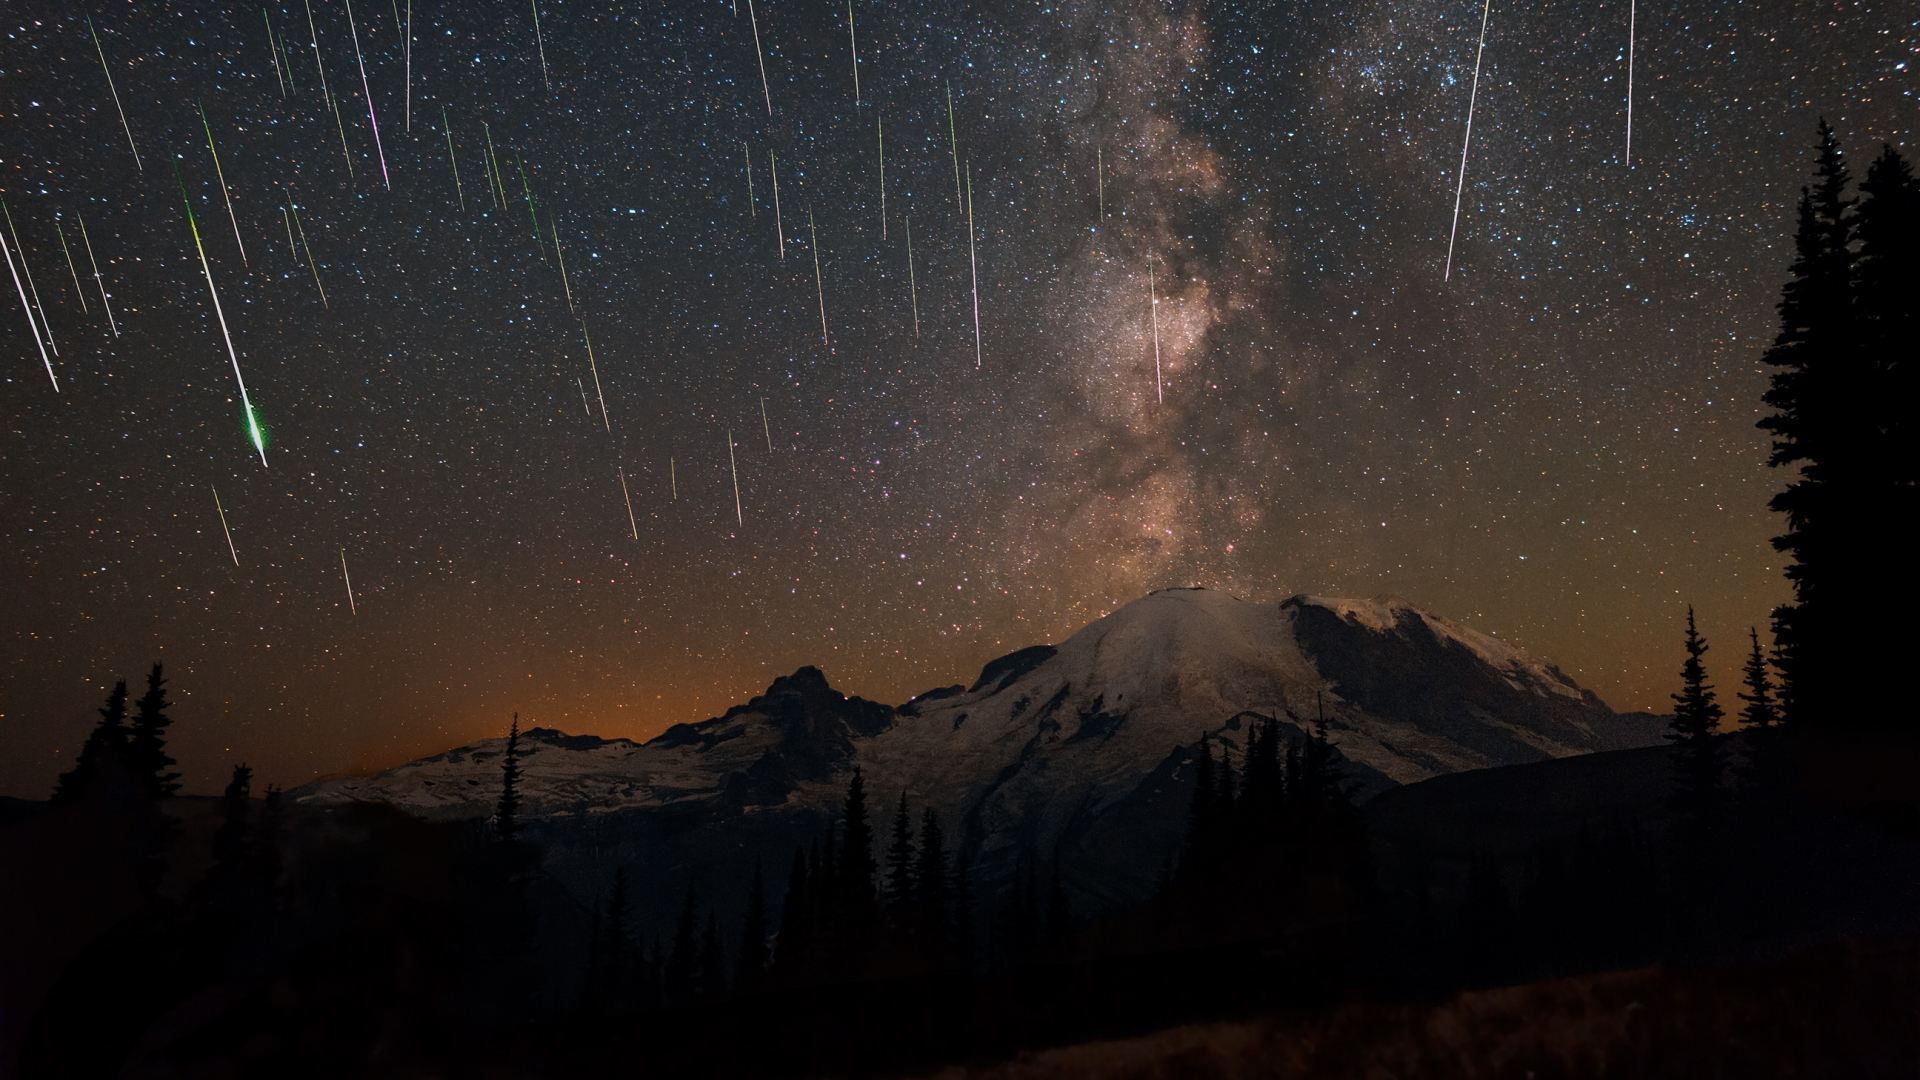 2015STE - Mount Rainier NP - Matthew Dieterich - Perseids 2015